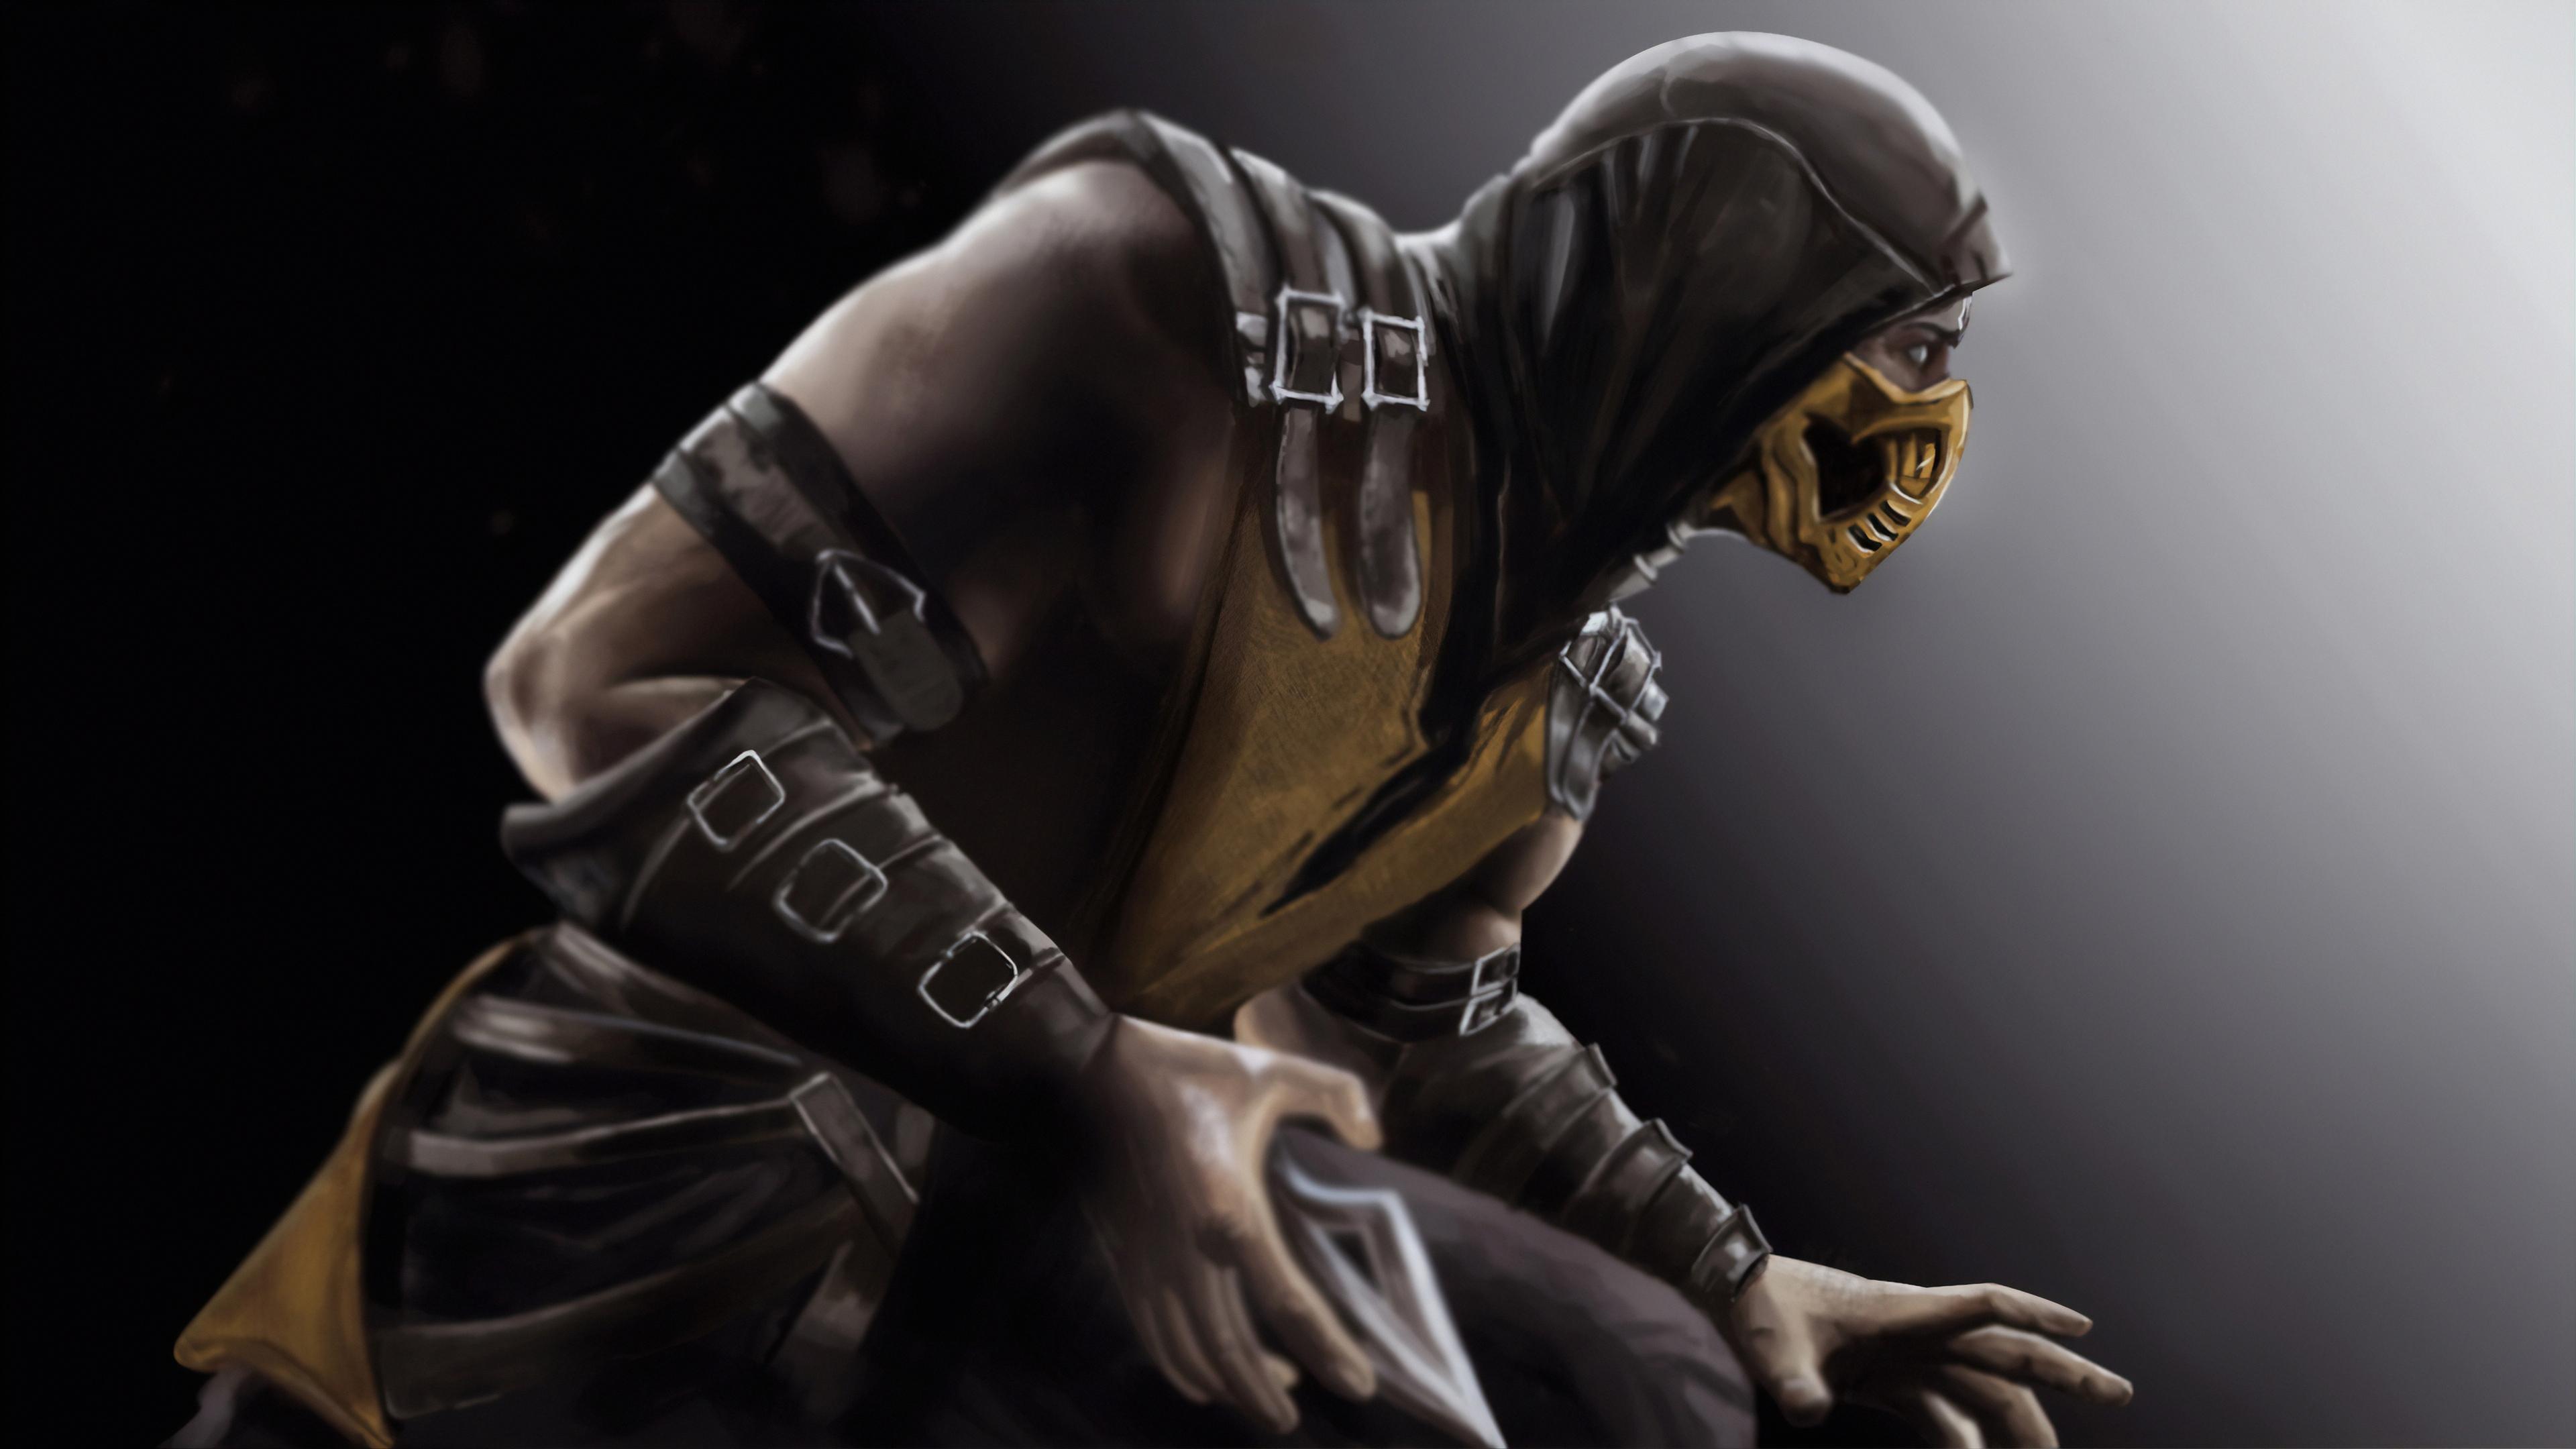 Wallpaper 4k Scorpion Mortal Kombat X Art 4k Wallpapers Games